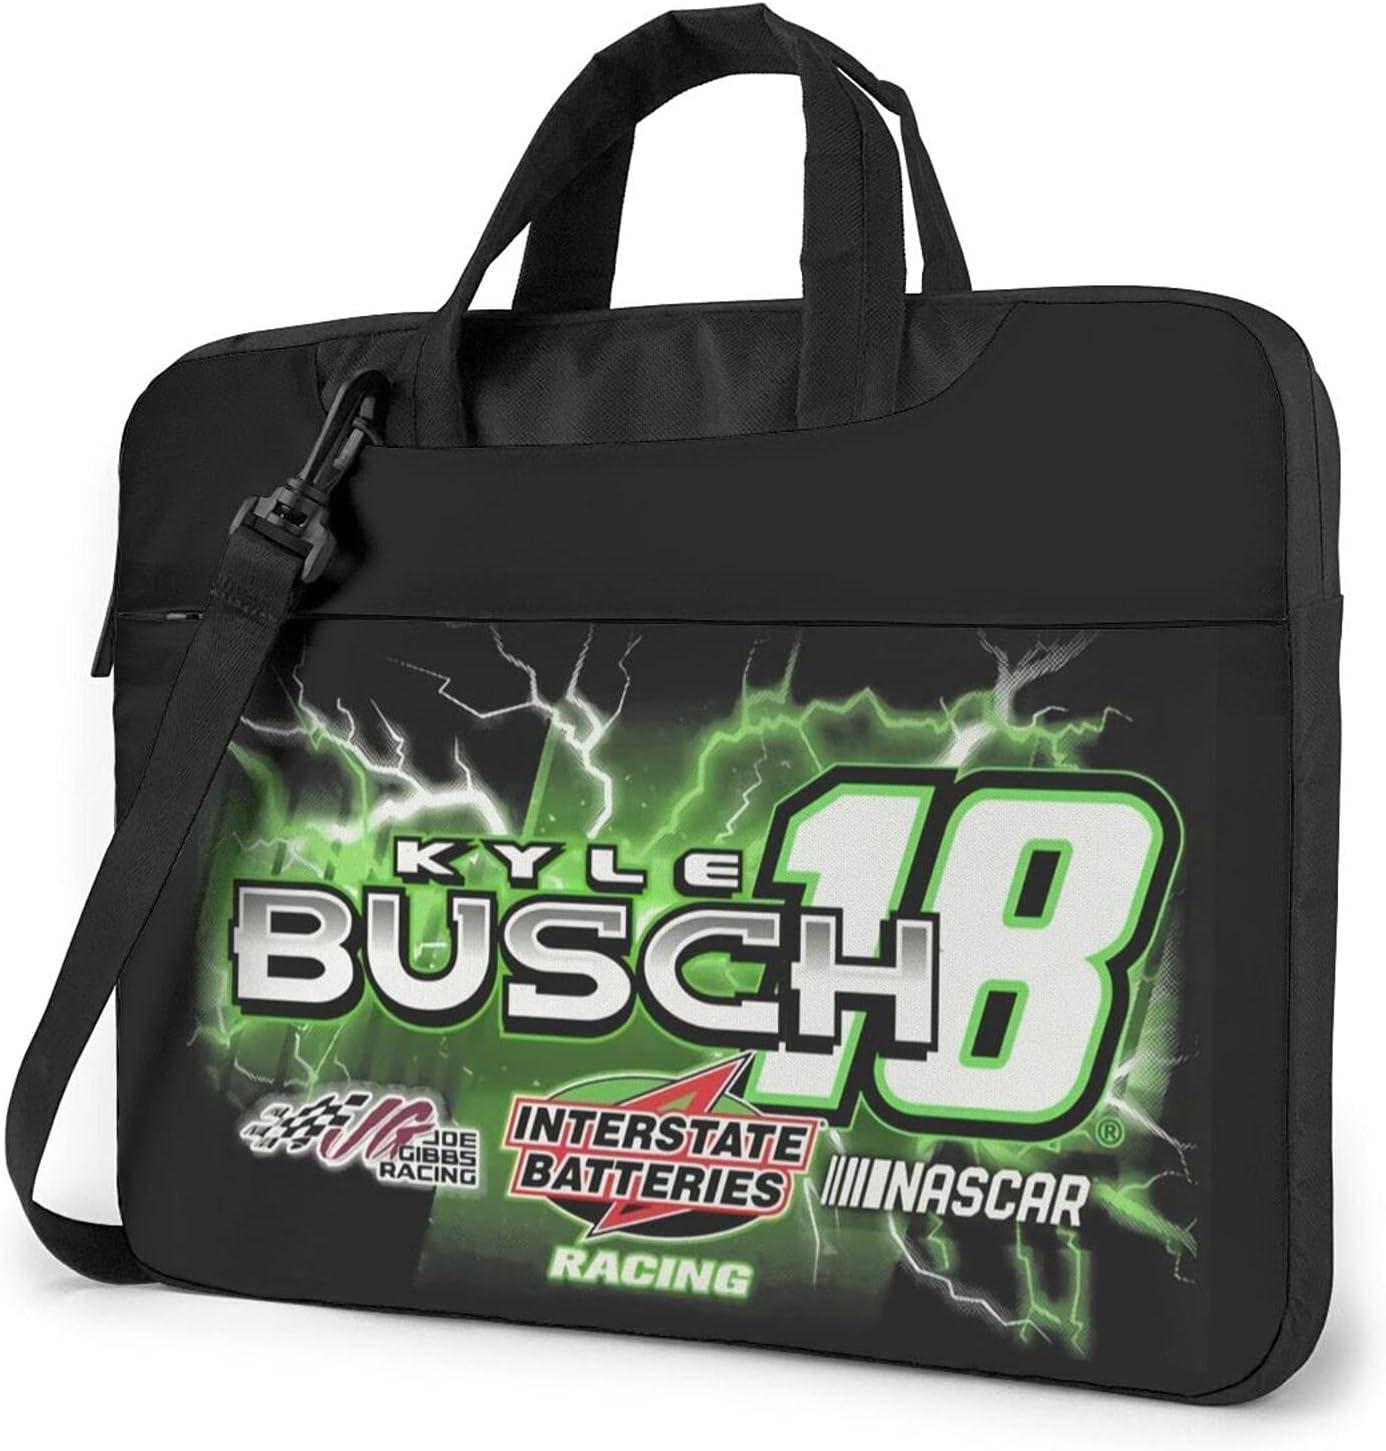 GAiNViEW Kyle 70% OFF Outlet Busch Laptop Multi-Function Expandable Super beauty product restock quality top Bag Should